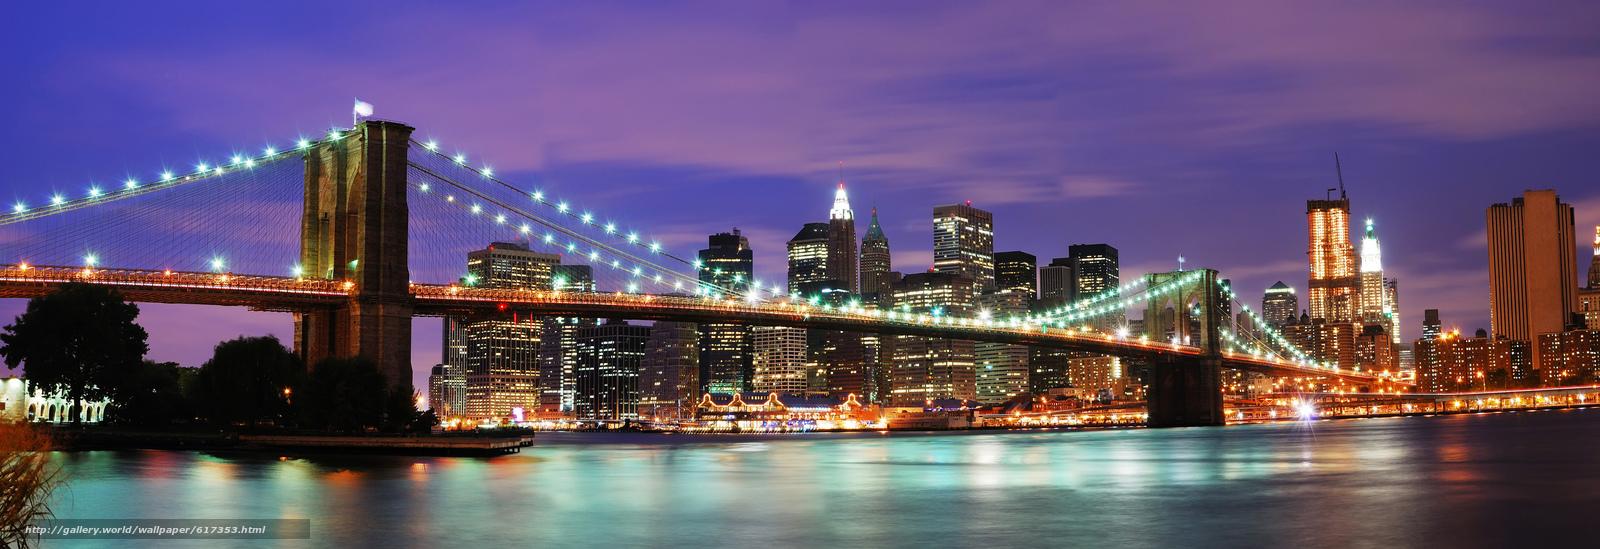 Tlcharger fond d 39 ecran brooklyn bridge nuit new york for Foto new york notte